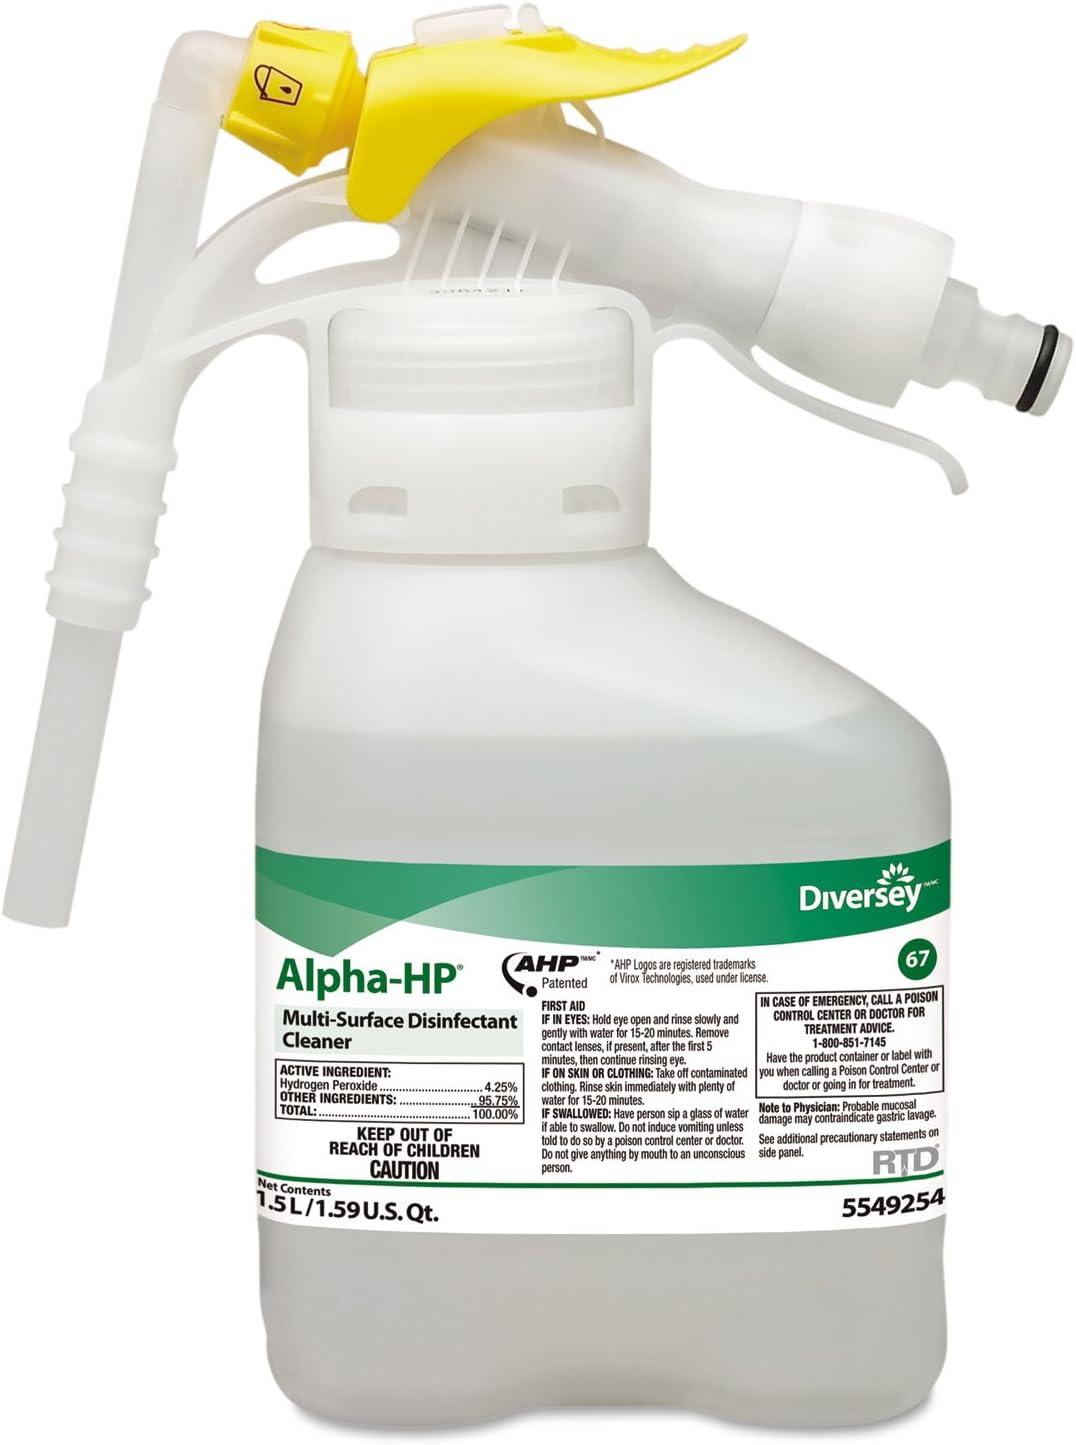 Alpha-HP Disinfectant Cleaner, 1.5 L, PK2